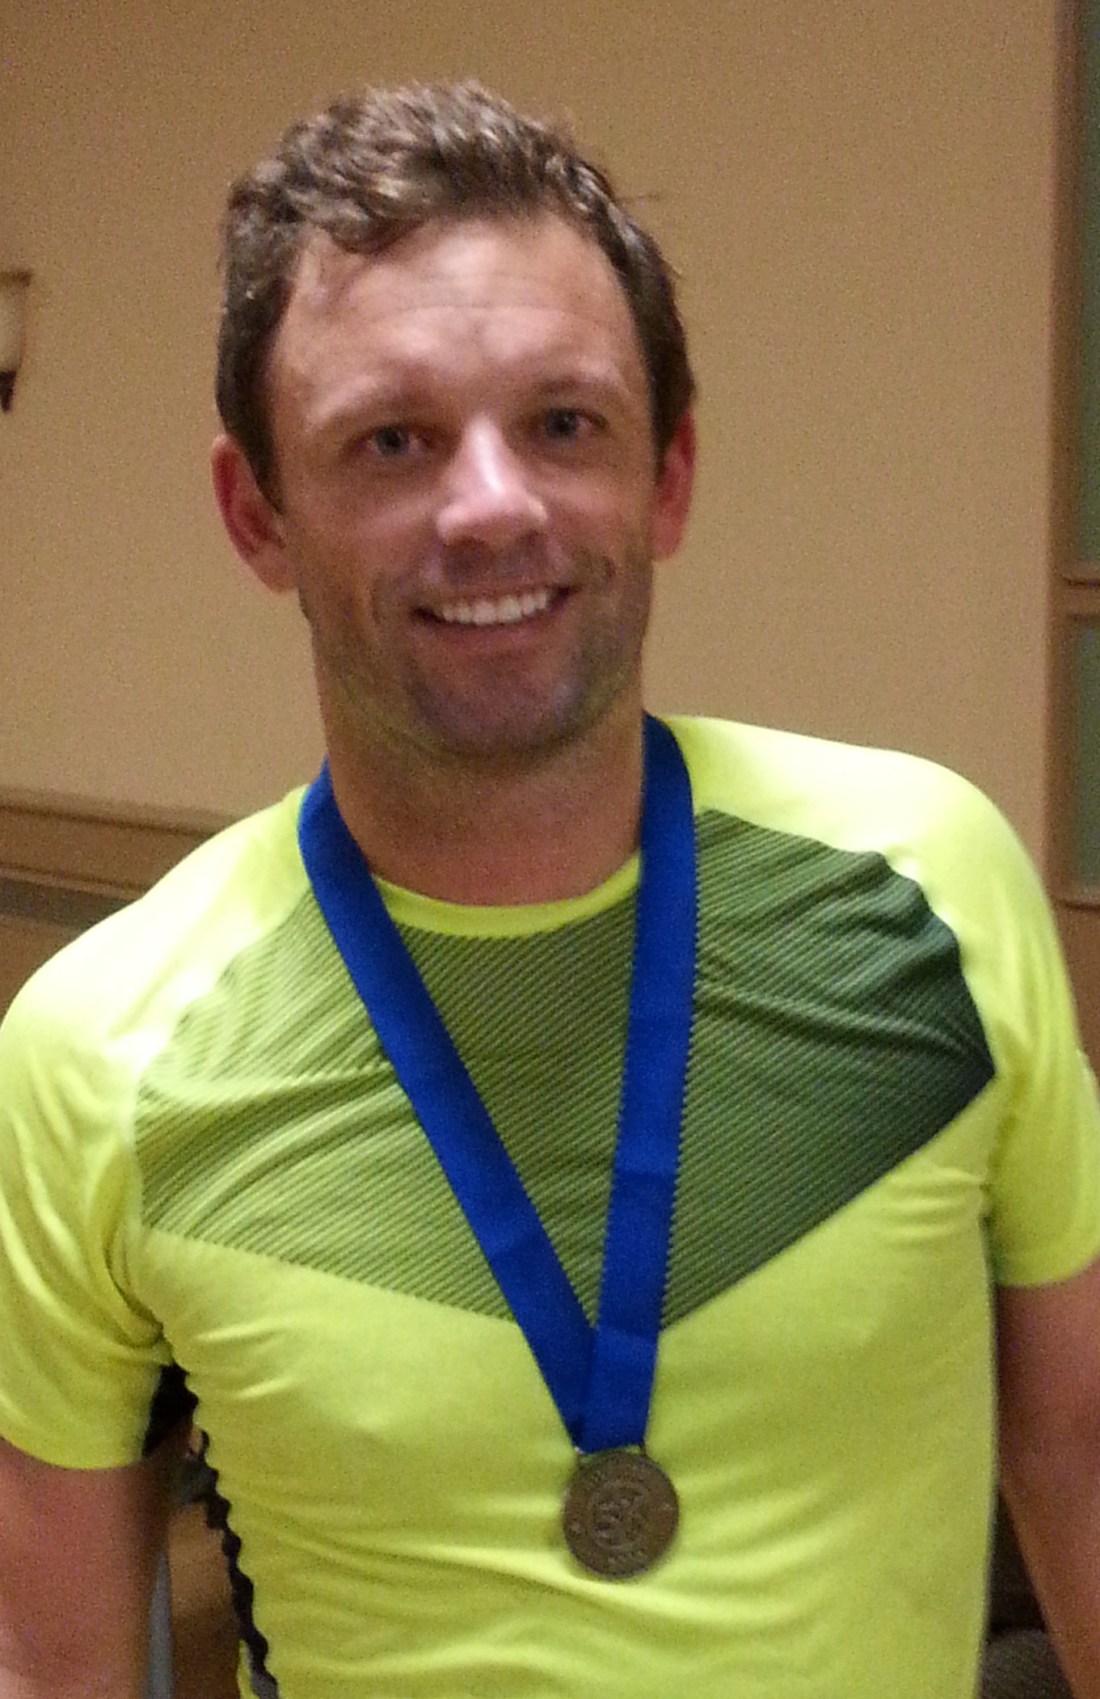 First 5K Medal, finishers medal